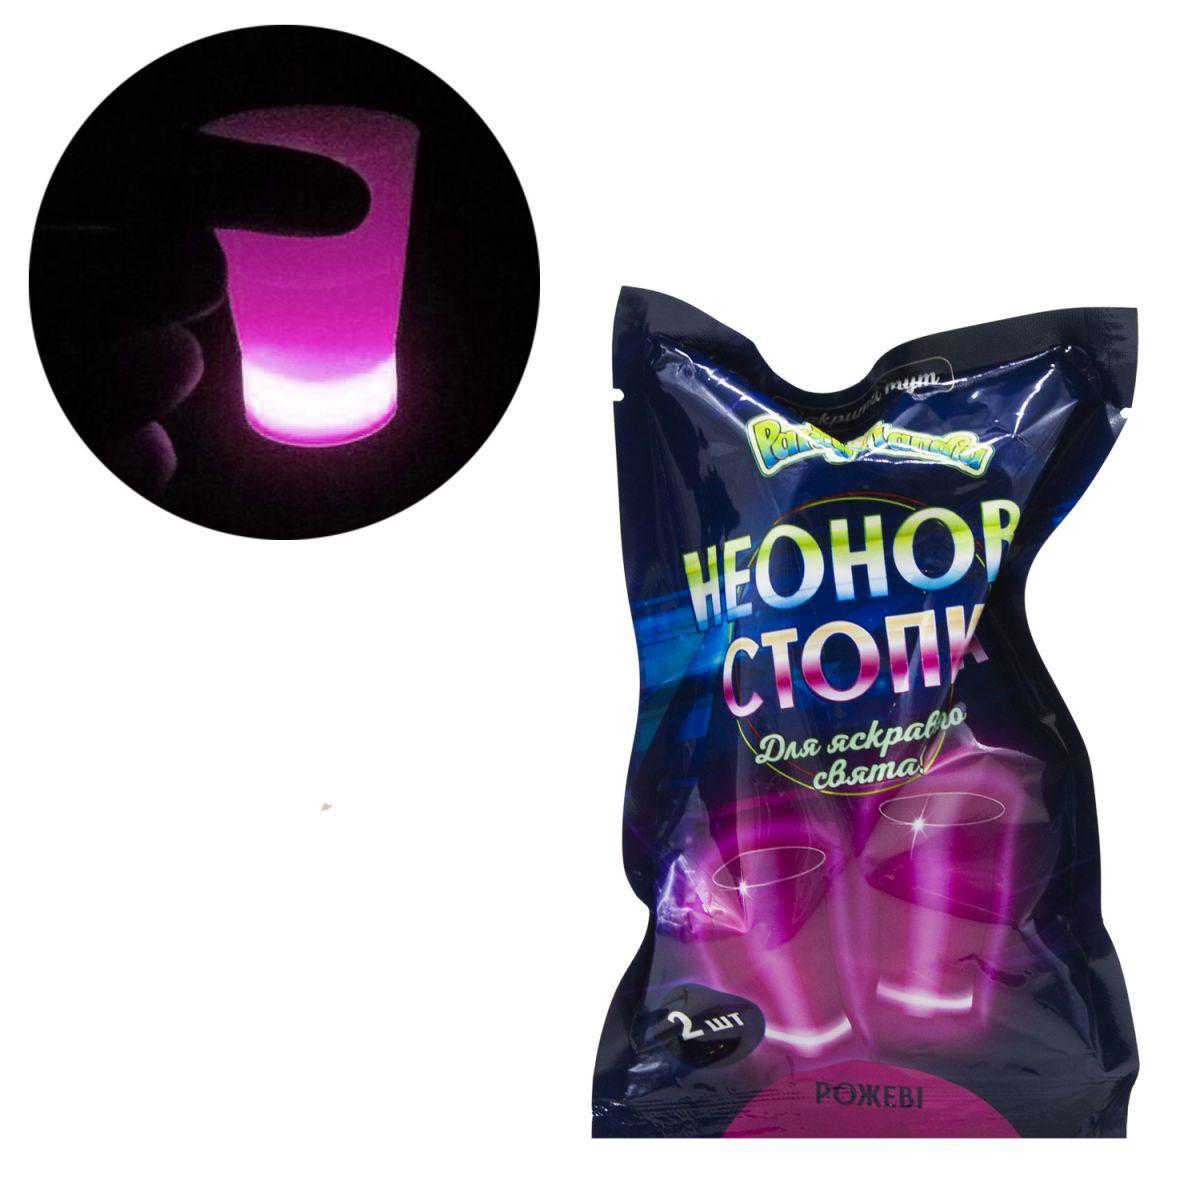 Неонова стопка рожевий PL112